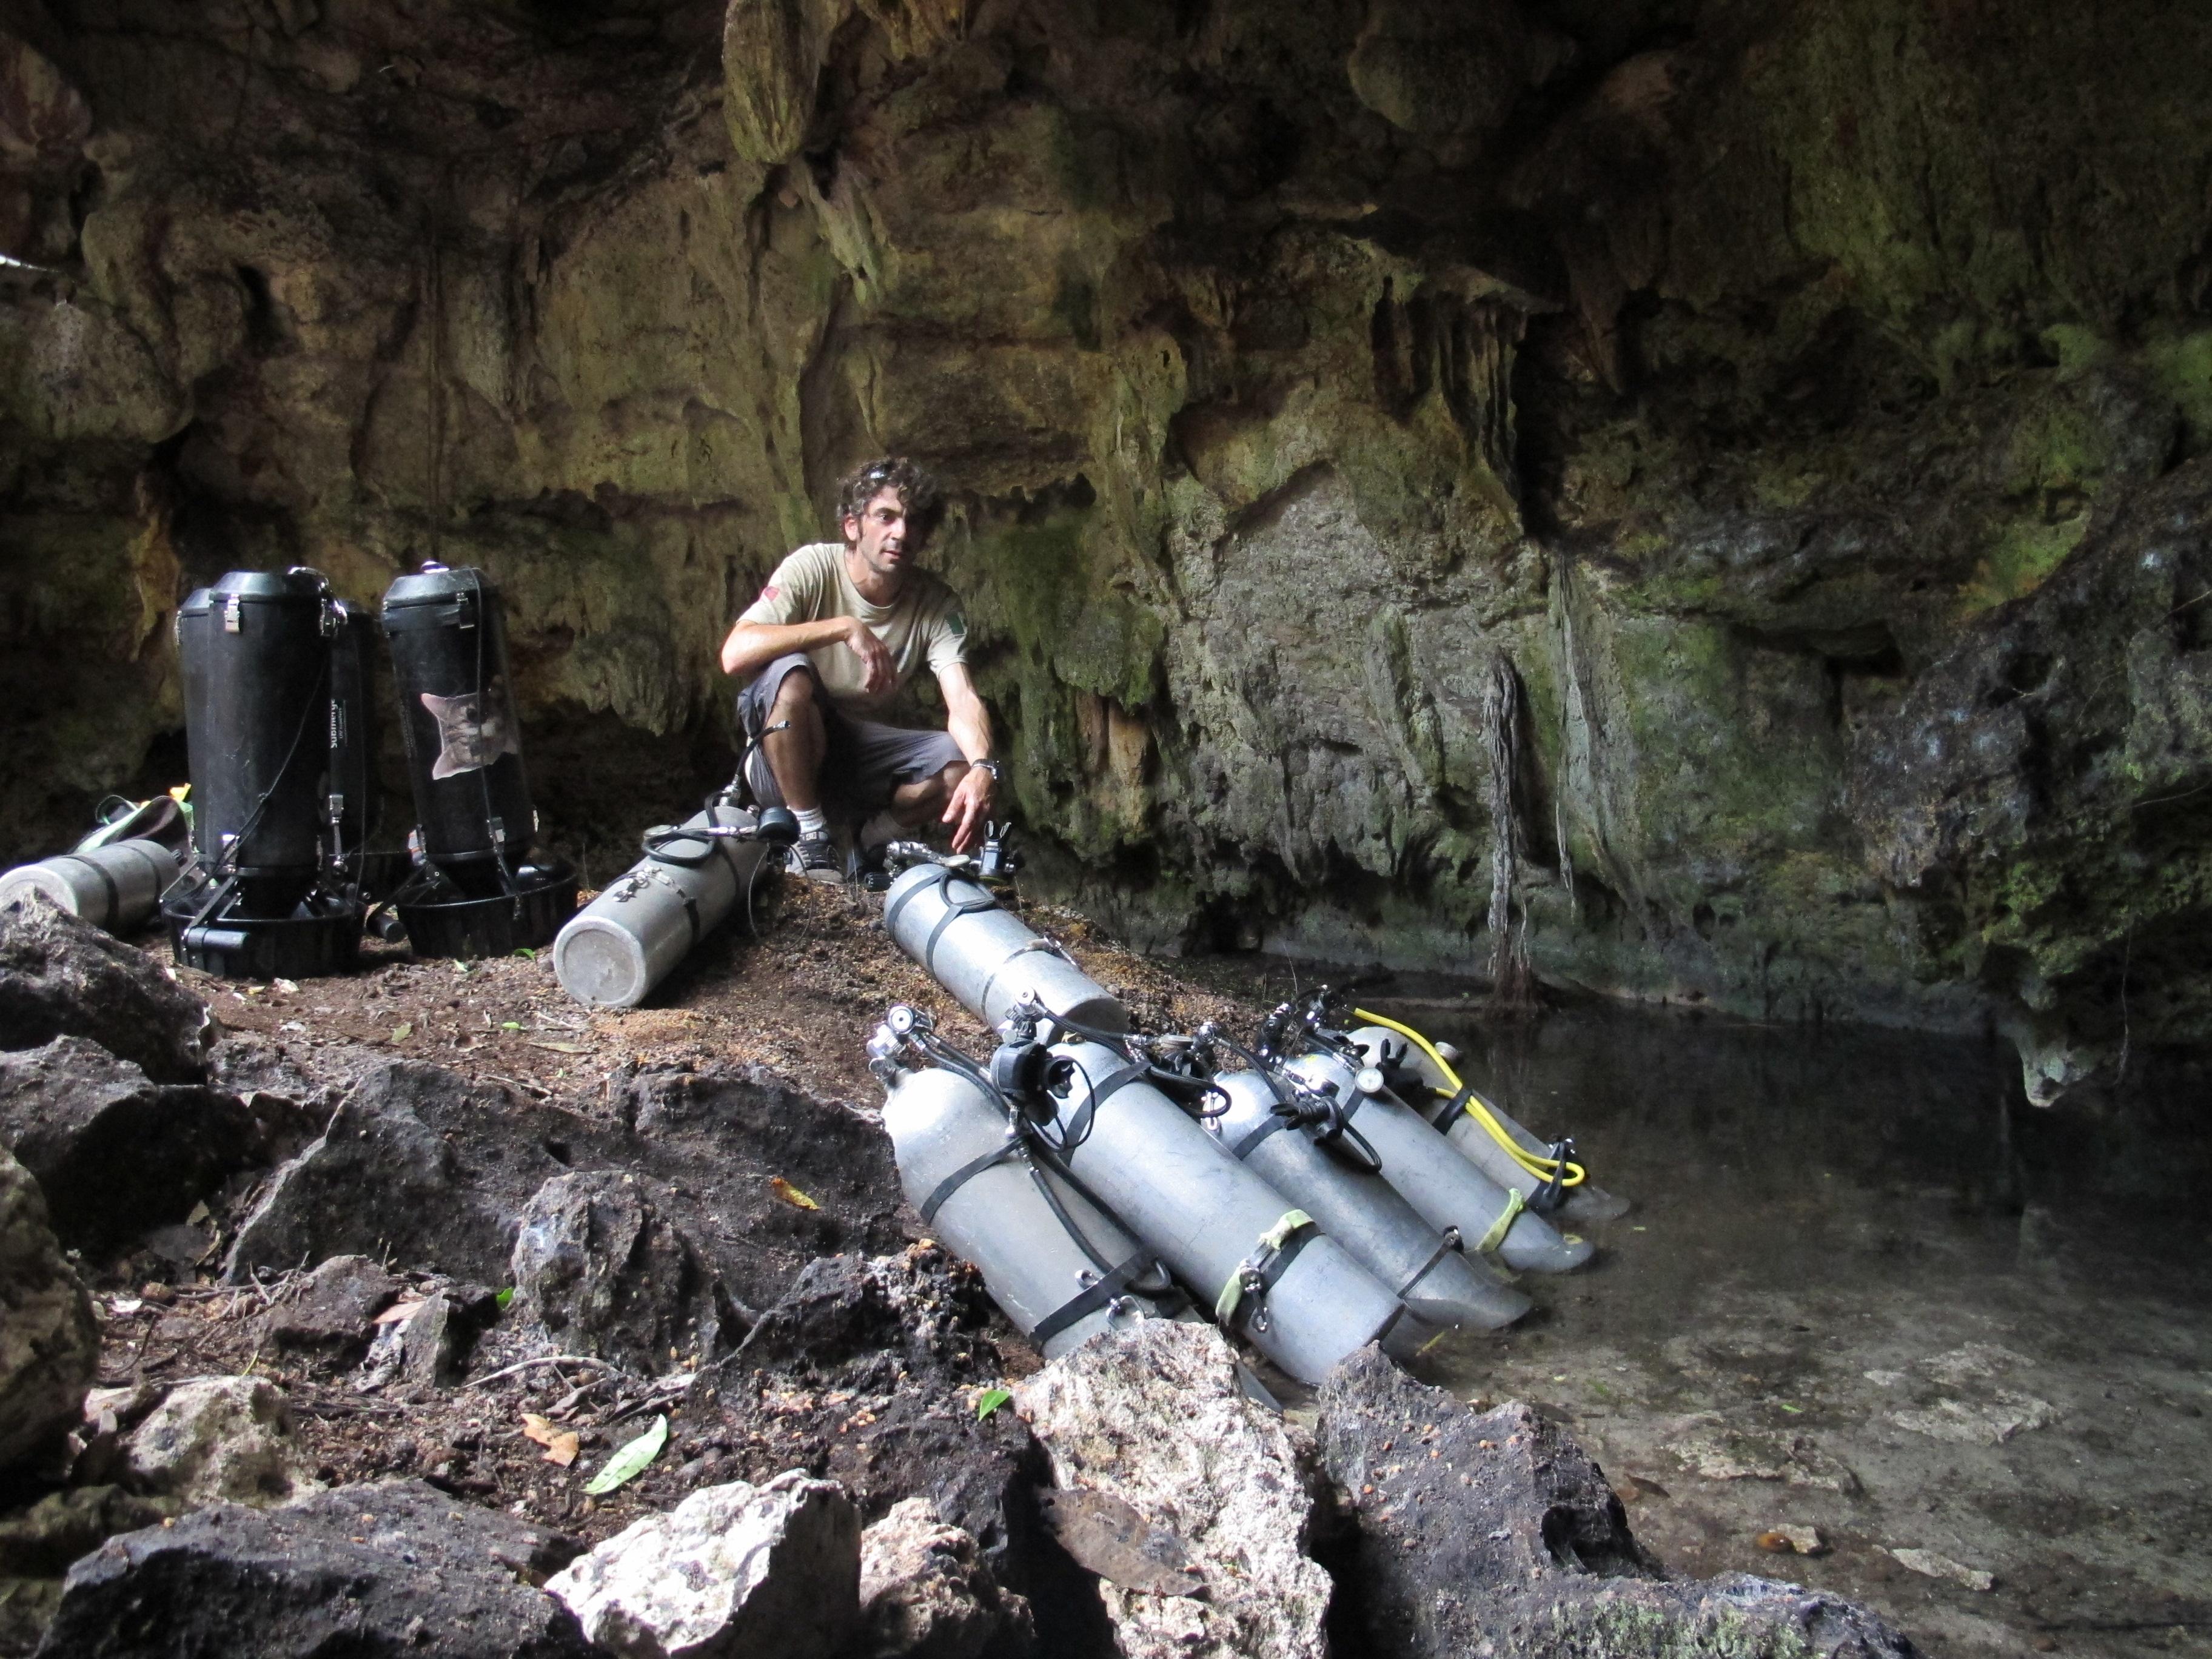 Vincent Cave Diving Instructor, Vincent Phocea, Cave Diving Instructor Mexico, TDI Instructor Mexico, Technical Diving Instructor Mexico